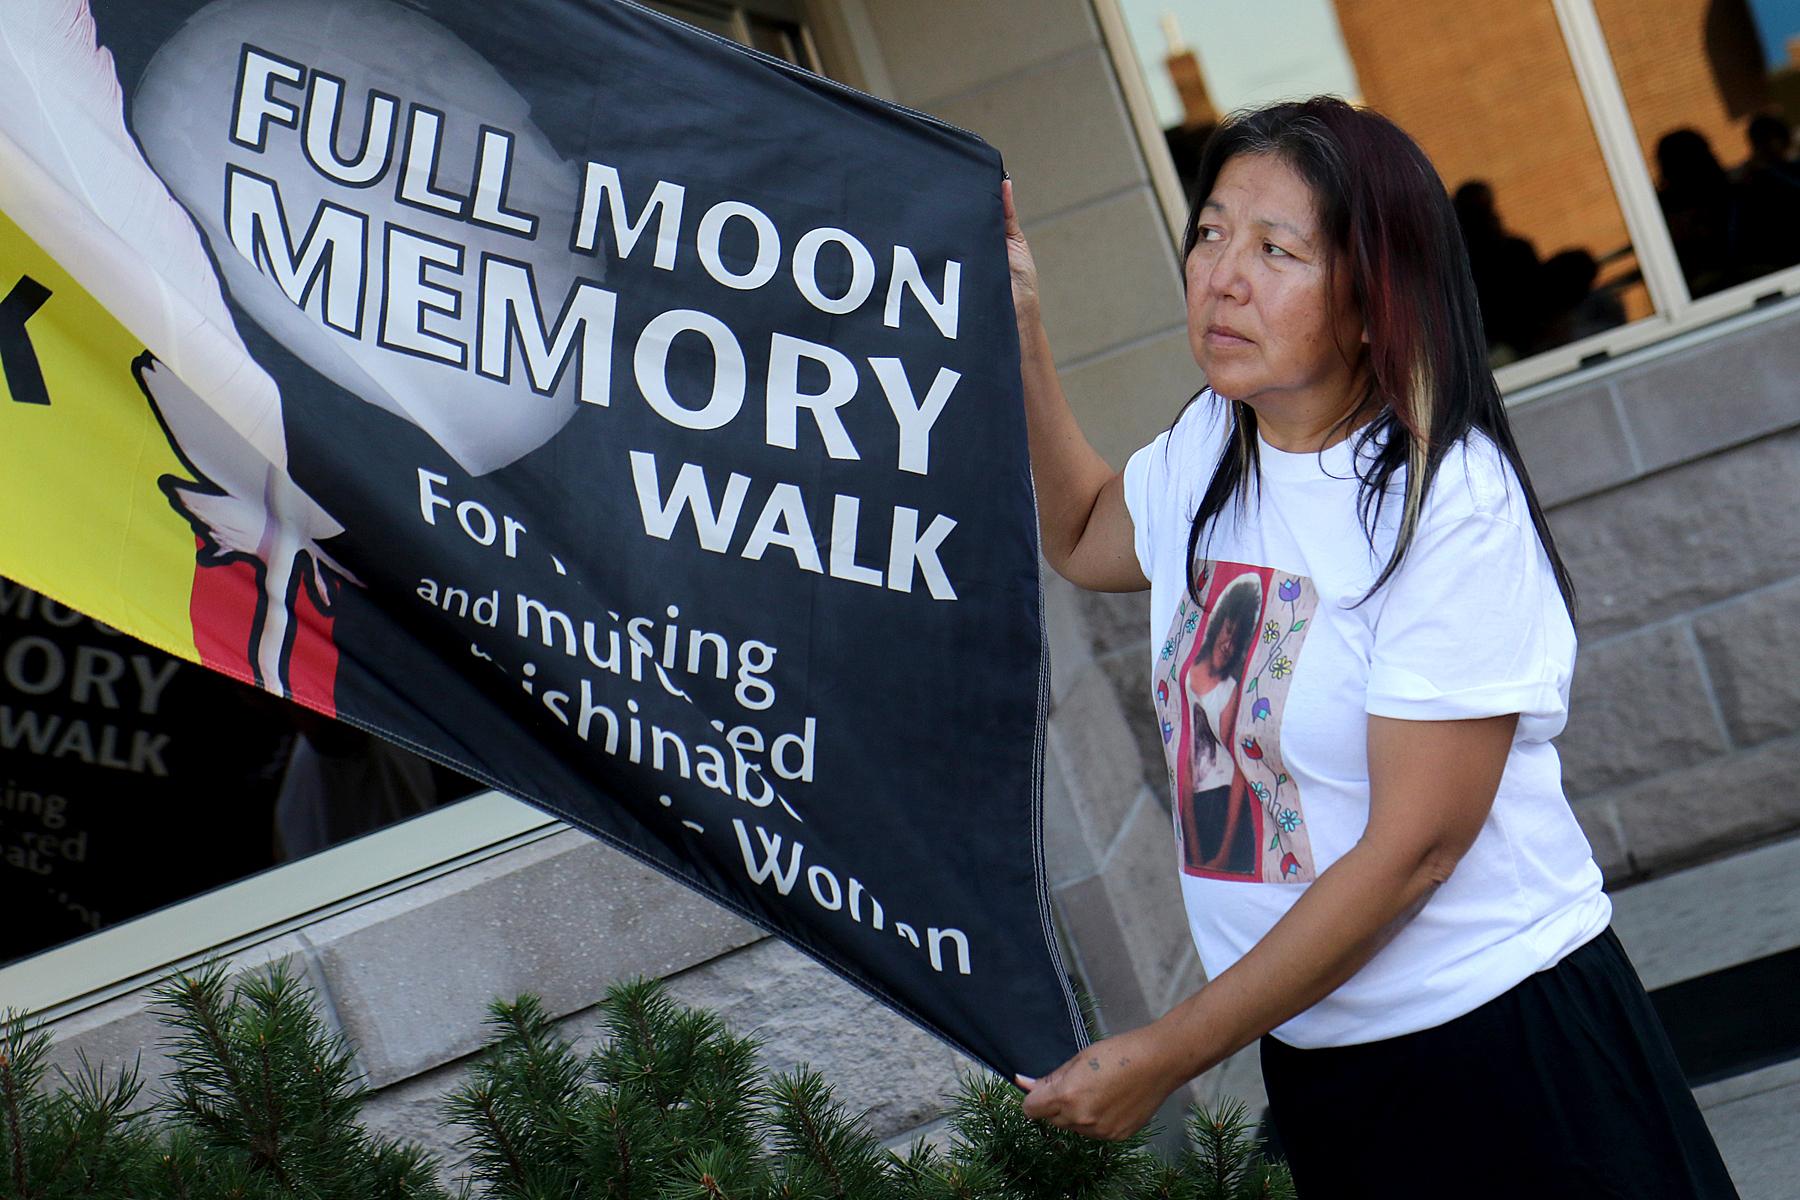 Full Moon Memory Walk keeps MMWIG in the spotlight